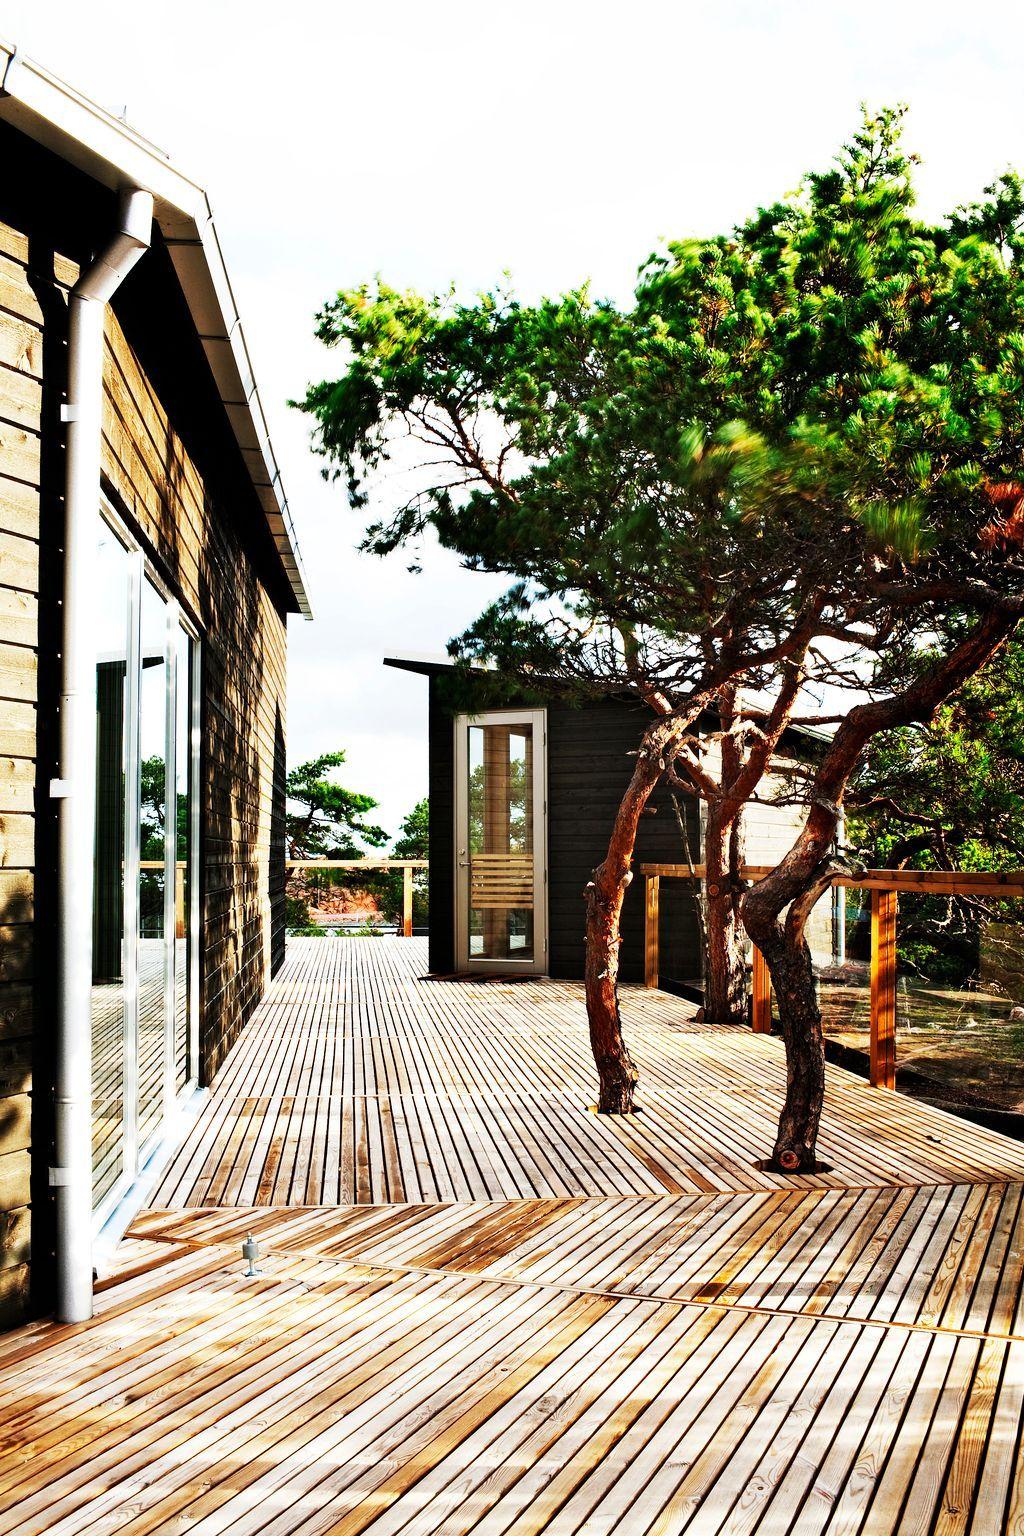 10 tr d ck som inspirerar till sommar och uteliv holzterrasse tischlermeister und bad oeynhausen. Black Bedroom Furniture Sets. Home Design Ideas